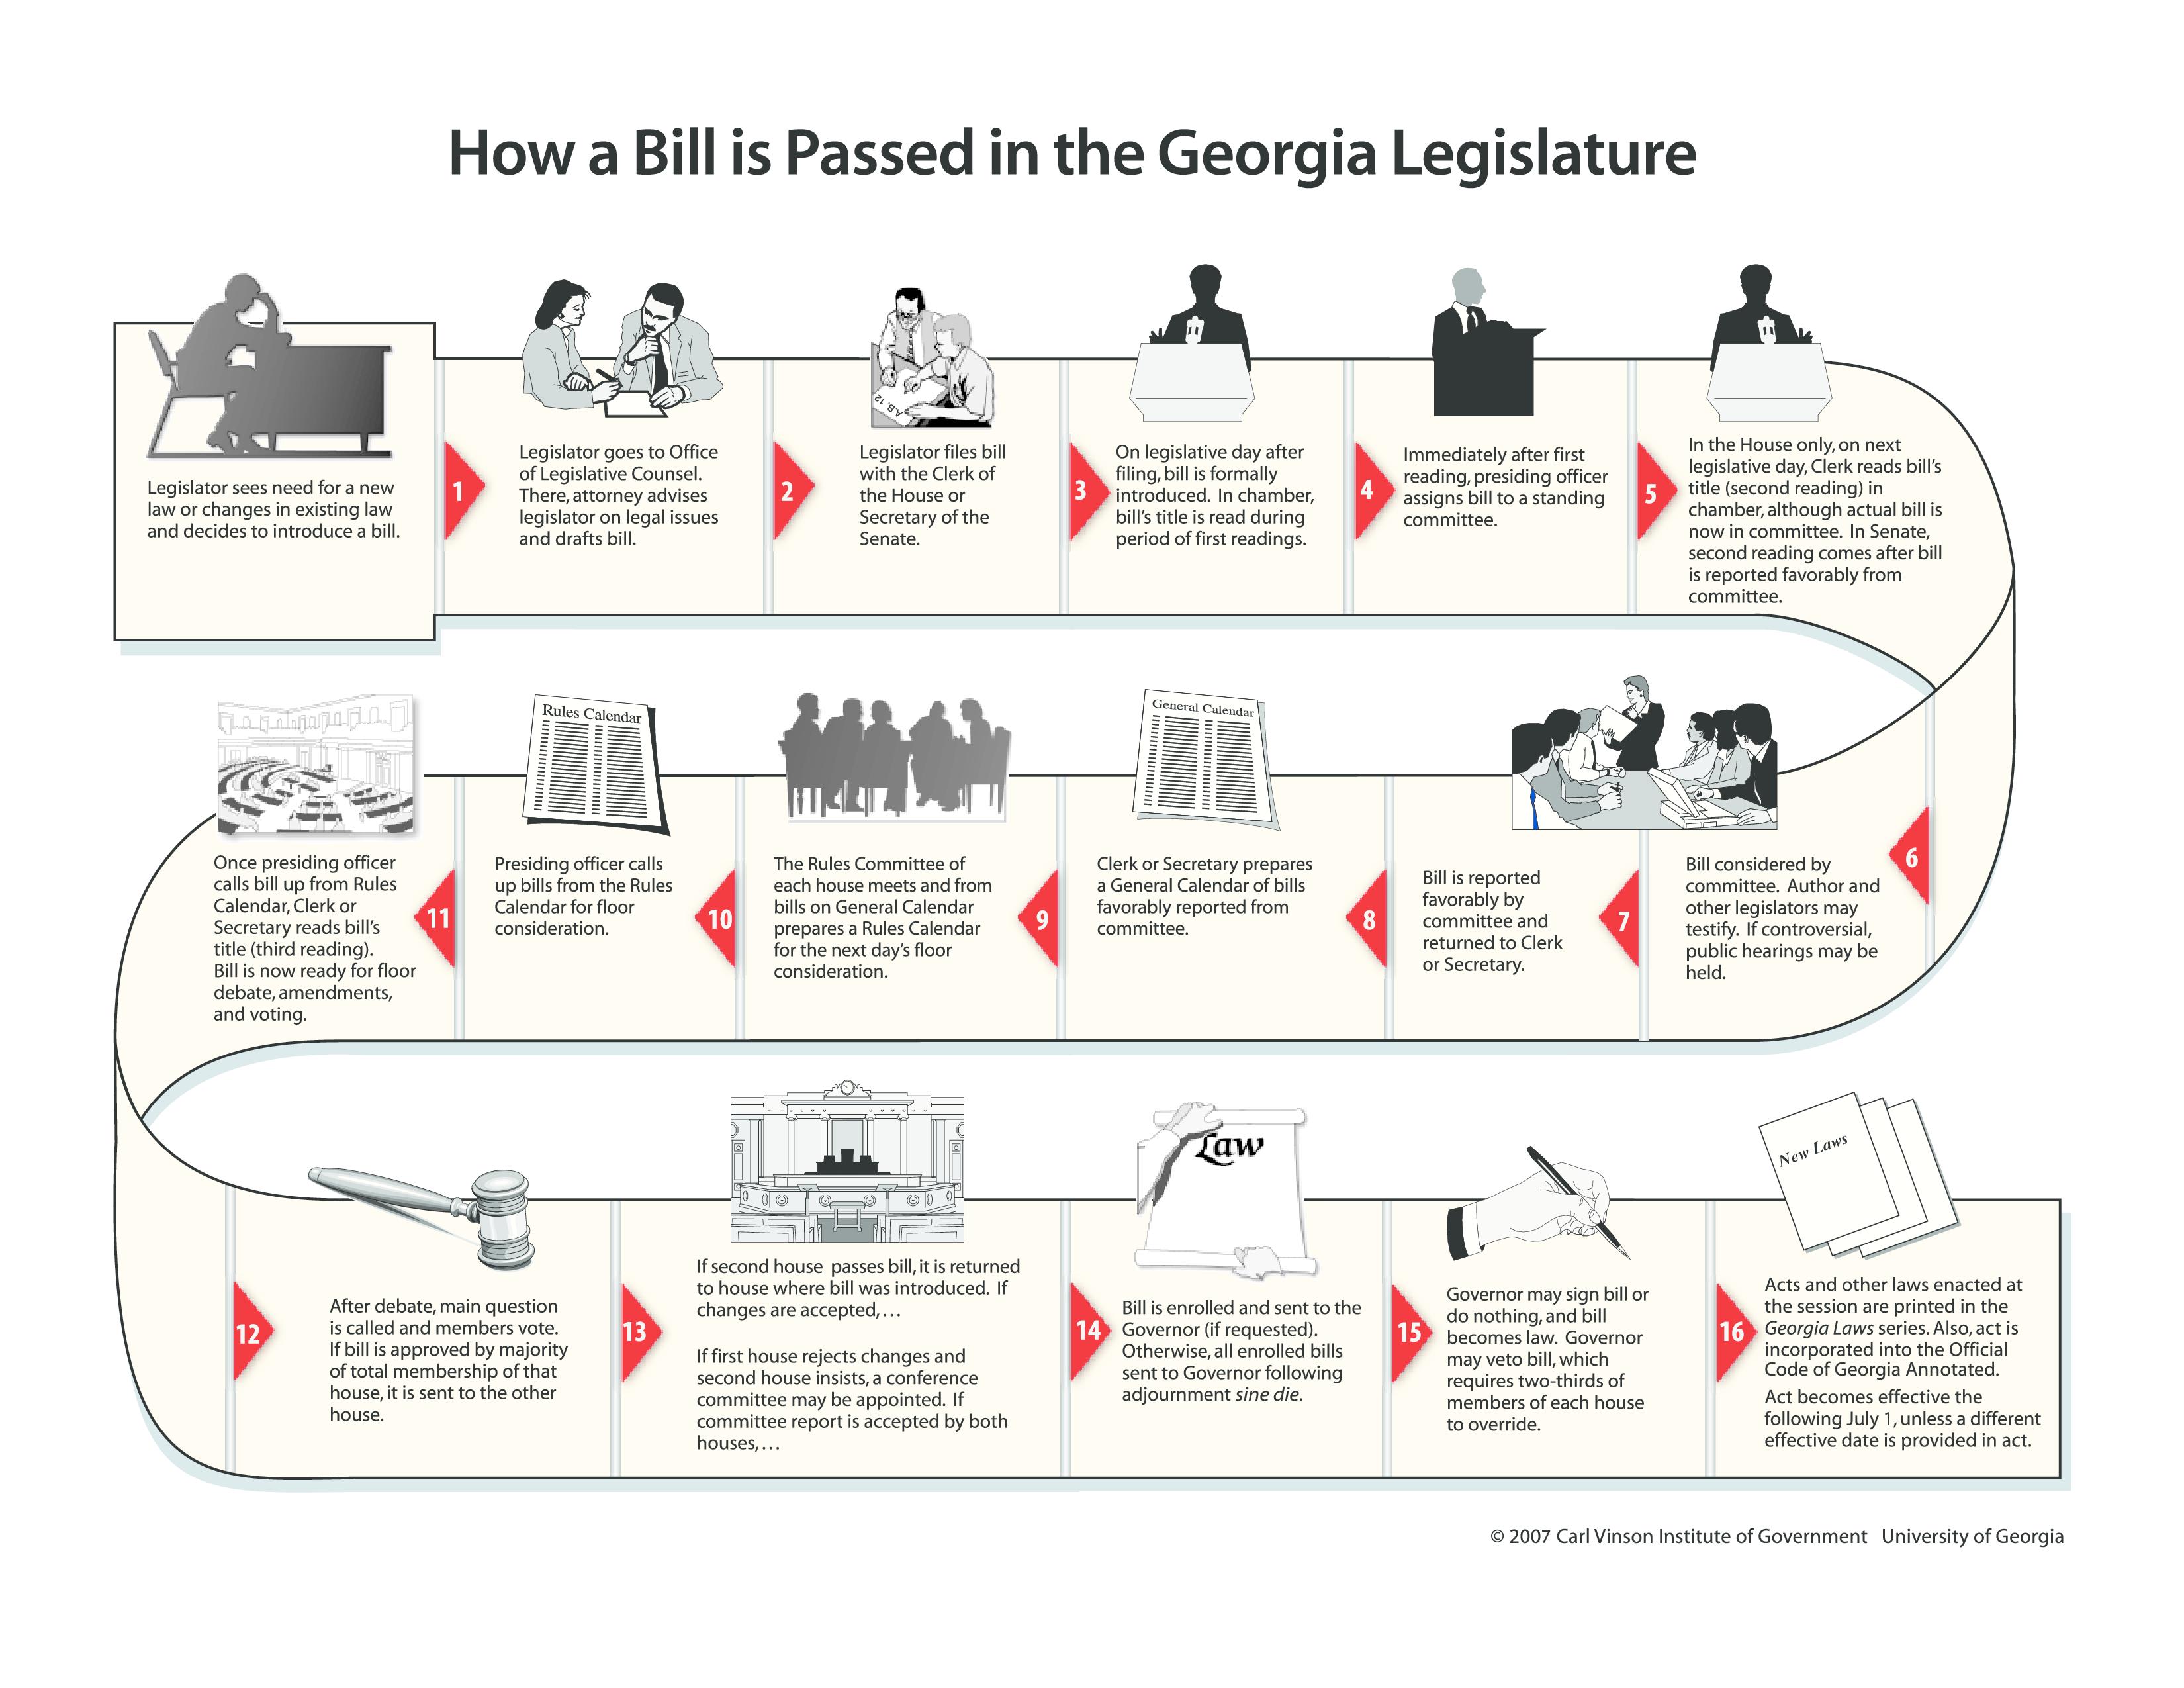 How a bill is passed in the Georgia Legislature